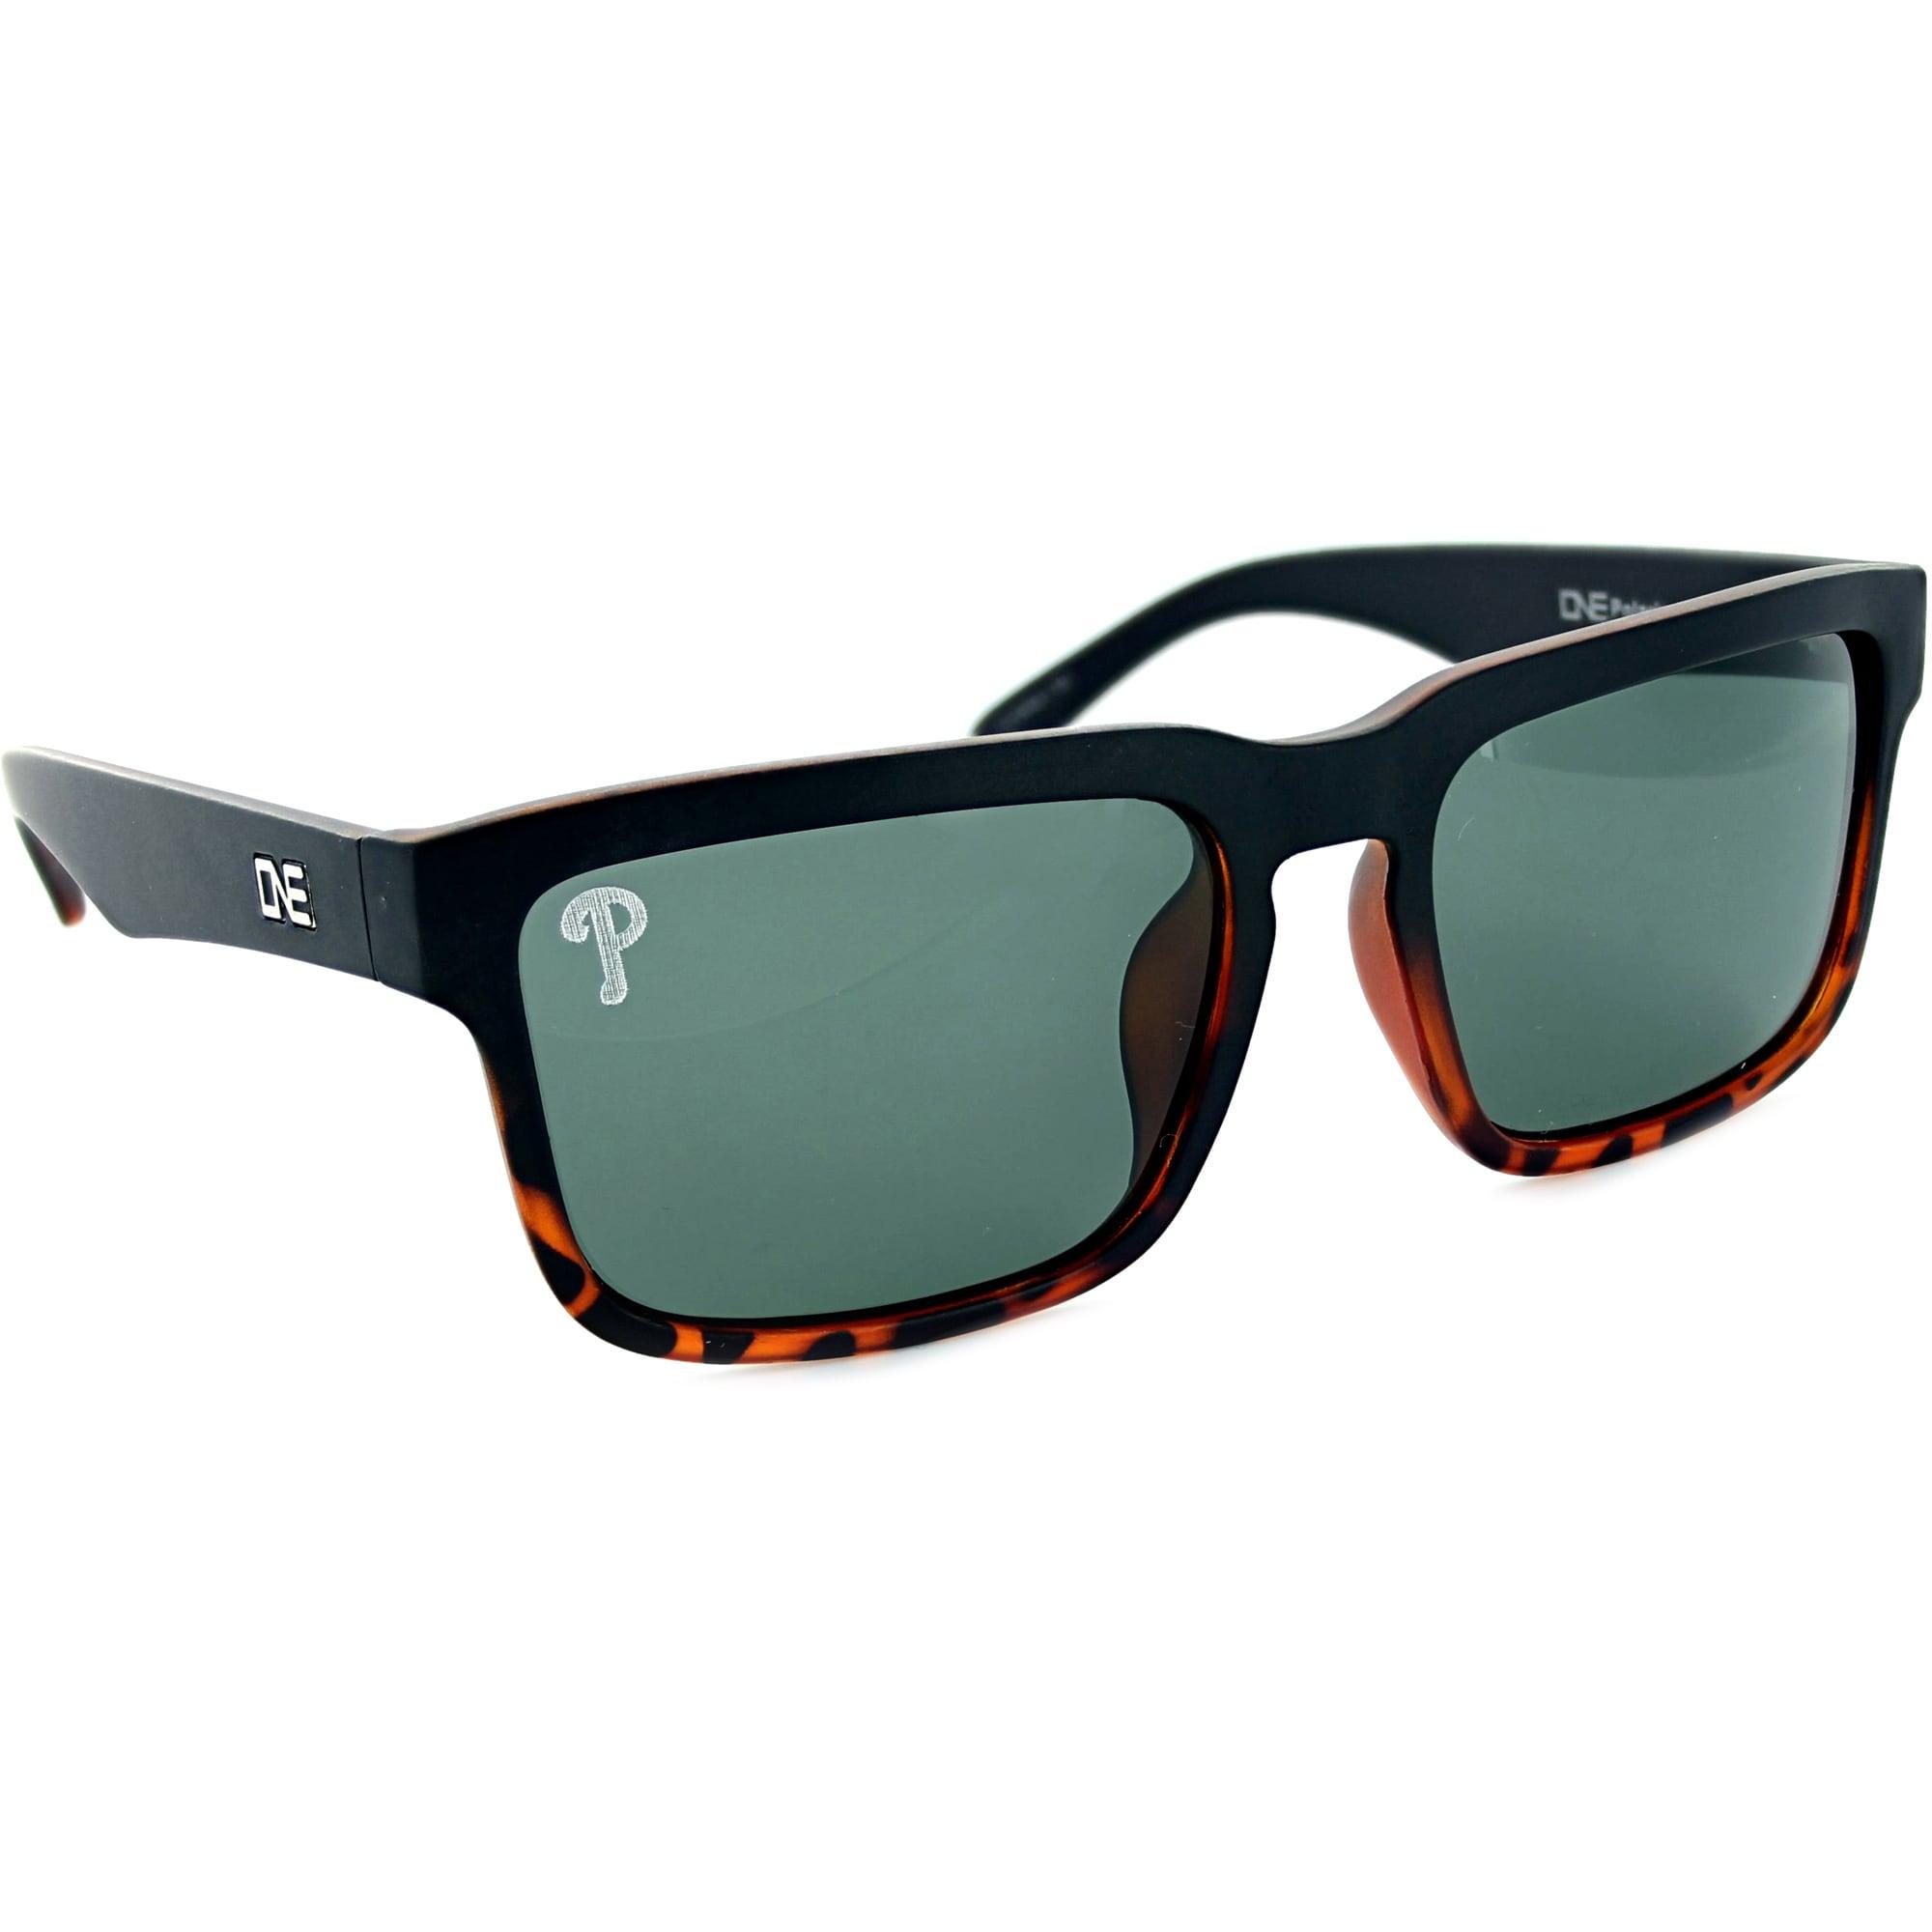 Philadelphia Phillies Mashup Sunglasses